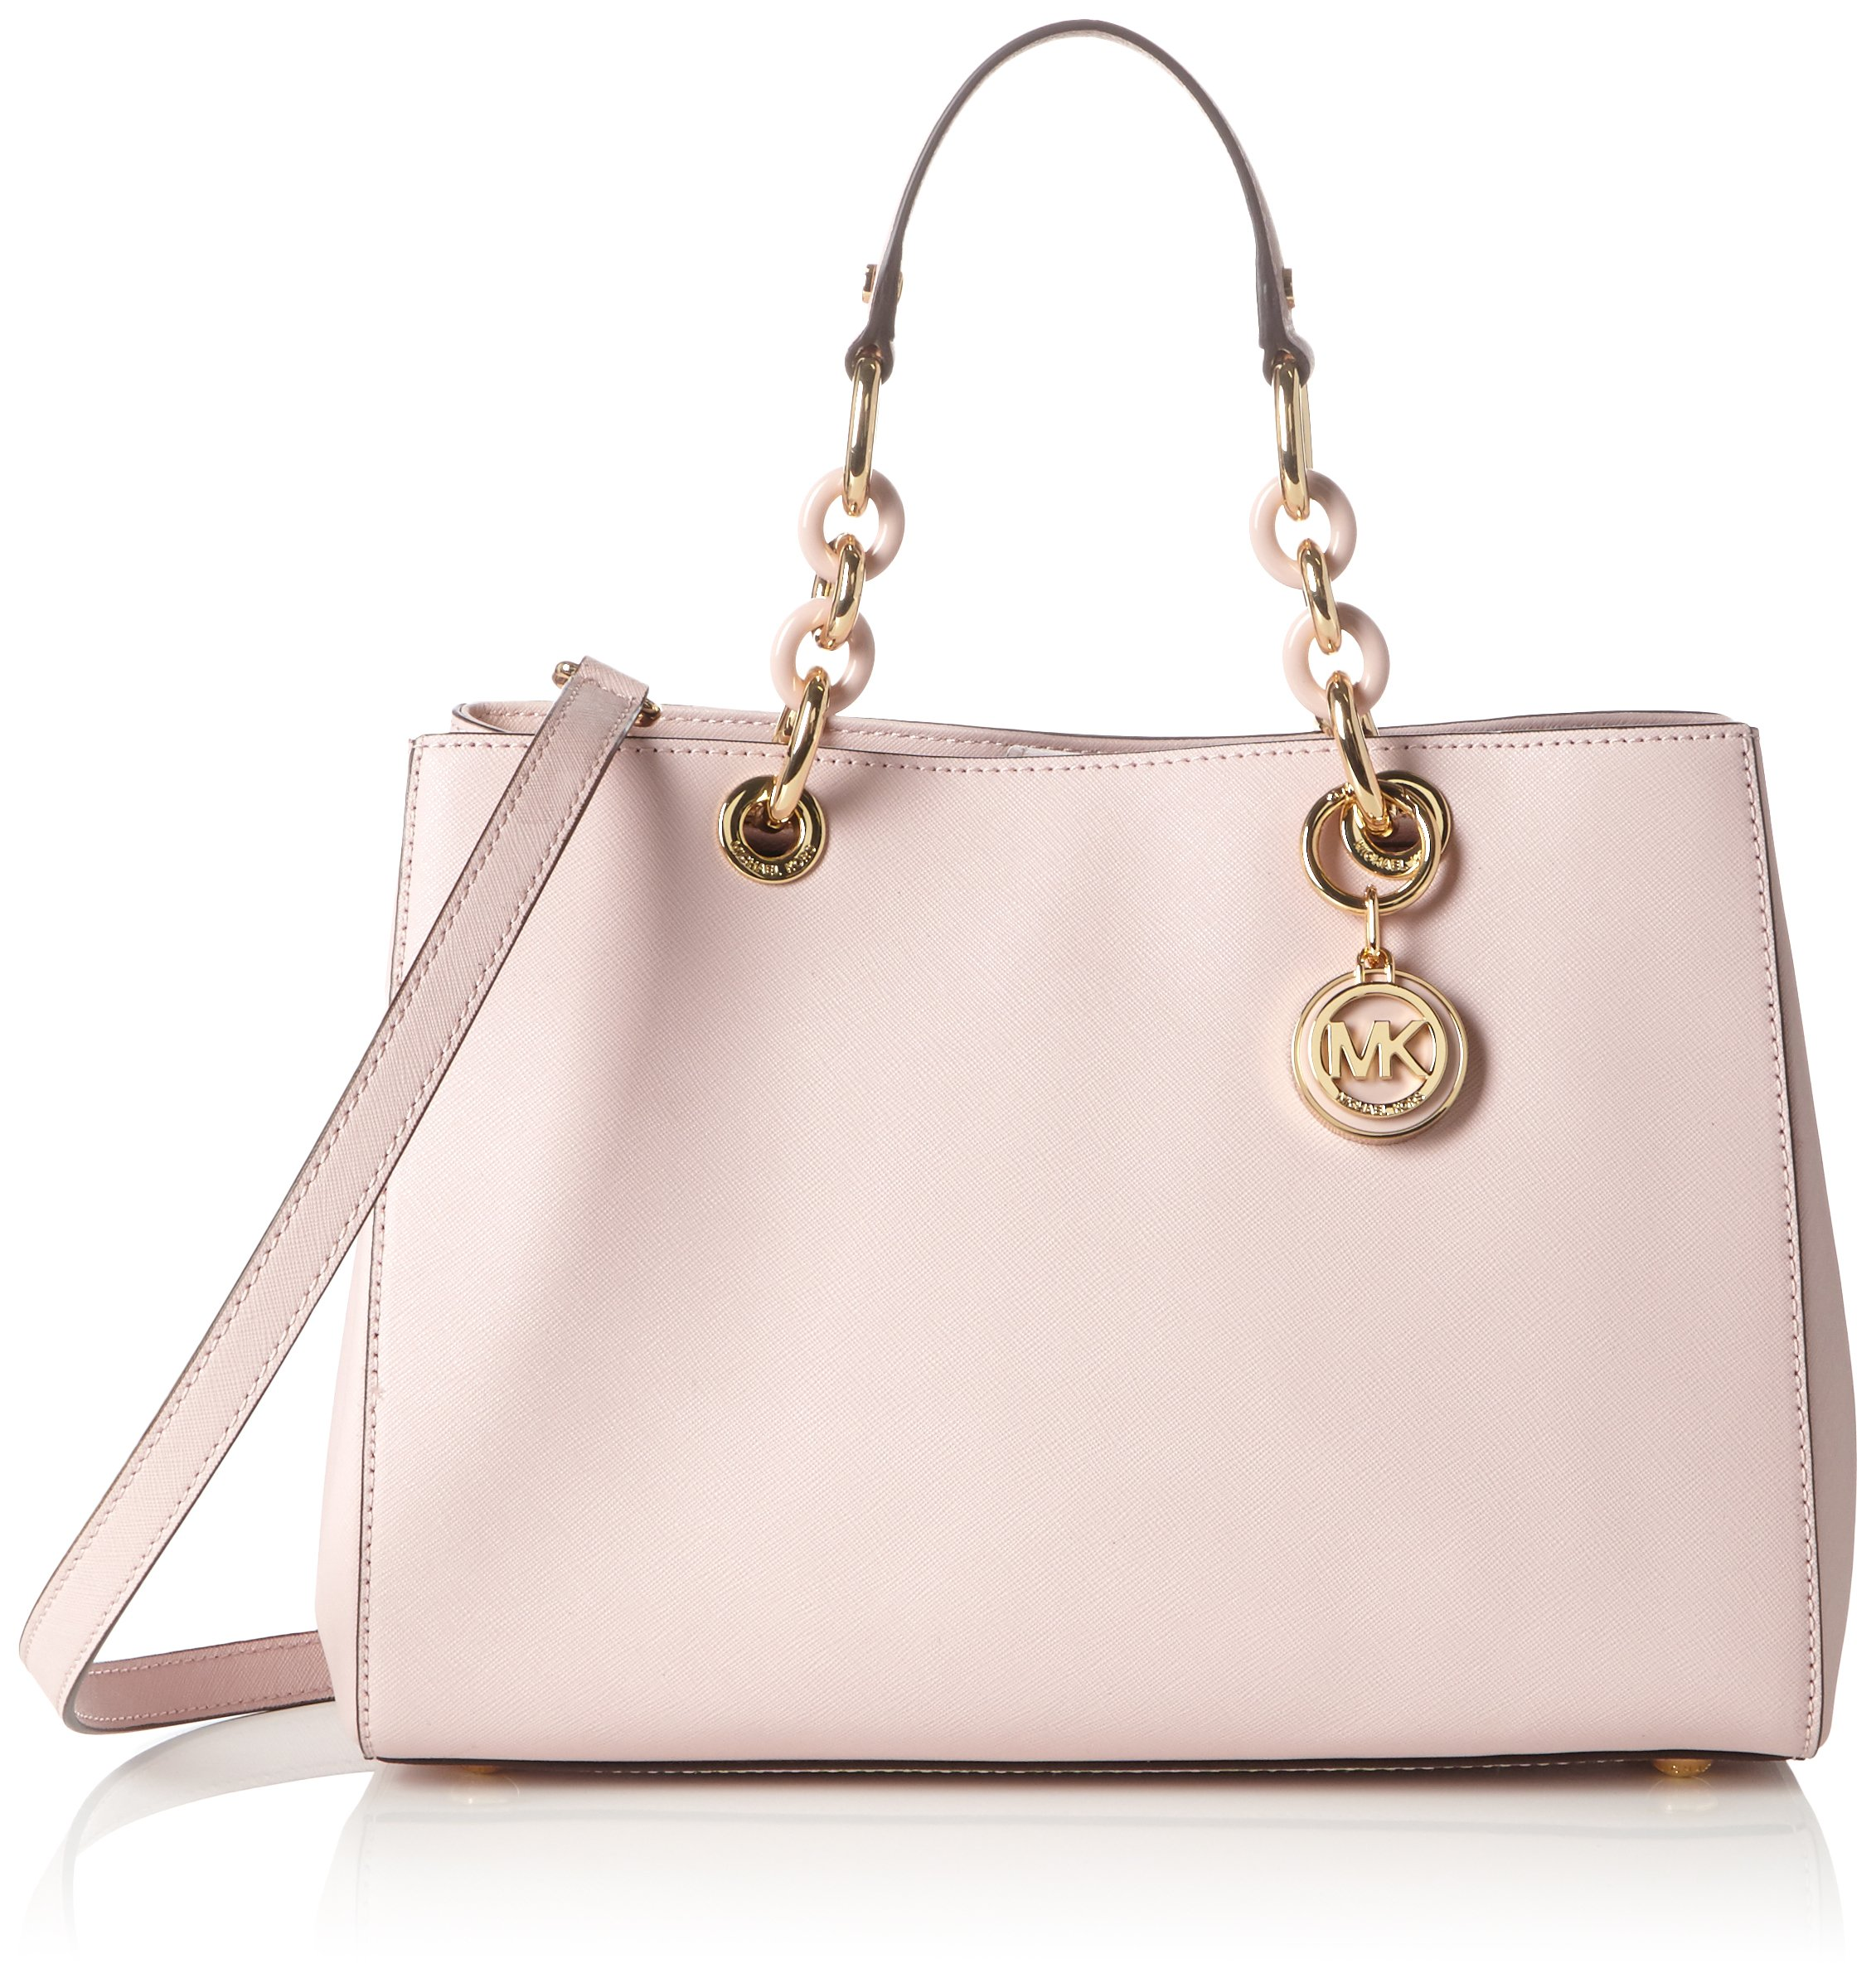 michael kors handbags on sale clearance amazon com rh amazon com